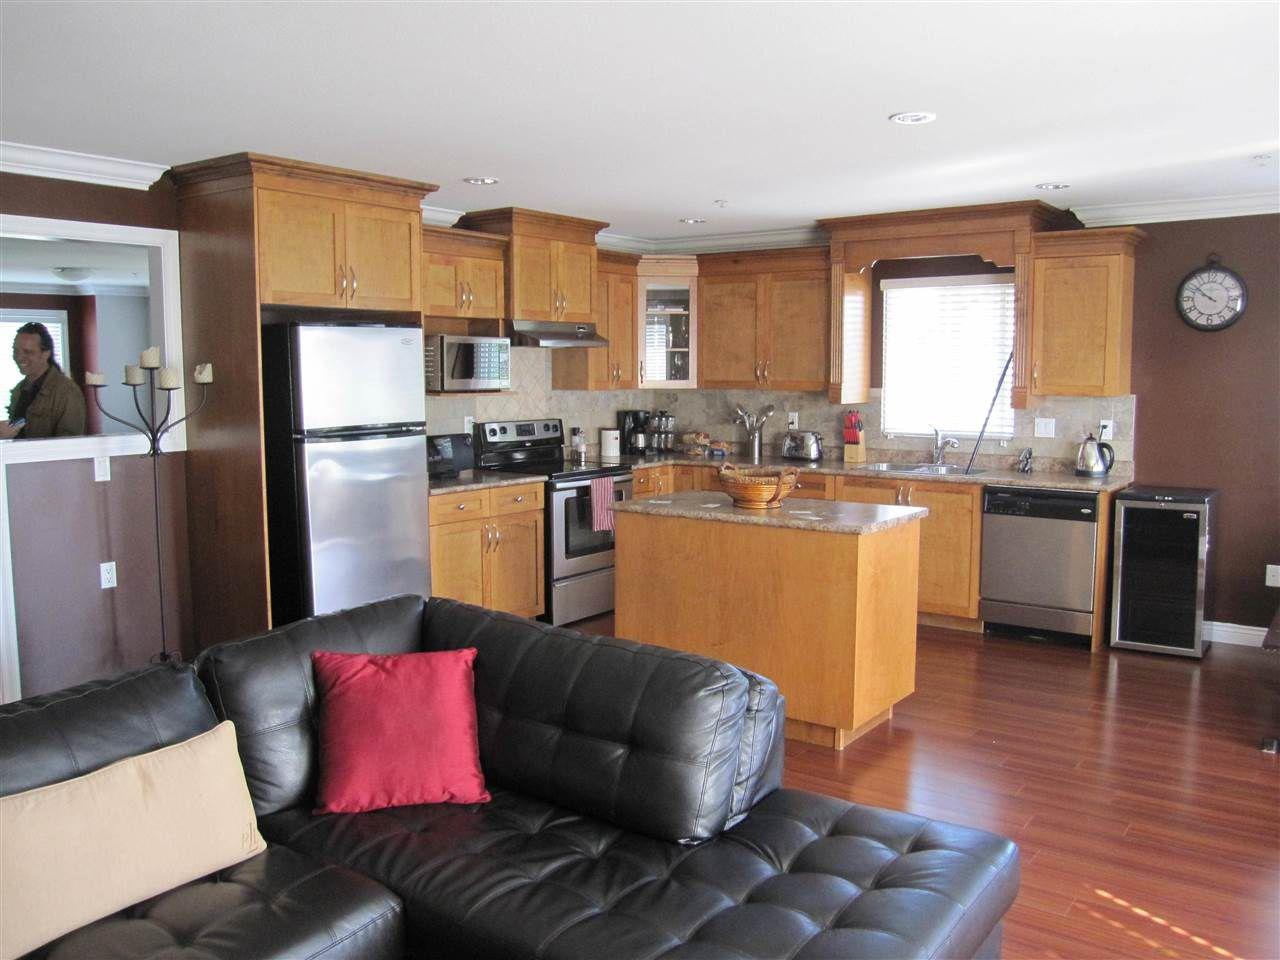 Photo 7: Photos: 11316 236 Street in Maple Ridge: Cottonwood MR House for sale : MLS®# R2062616